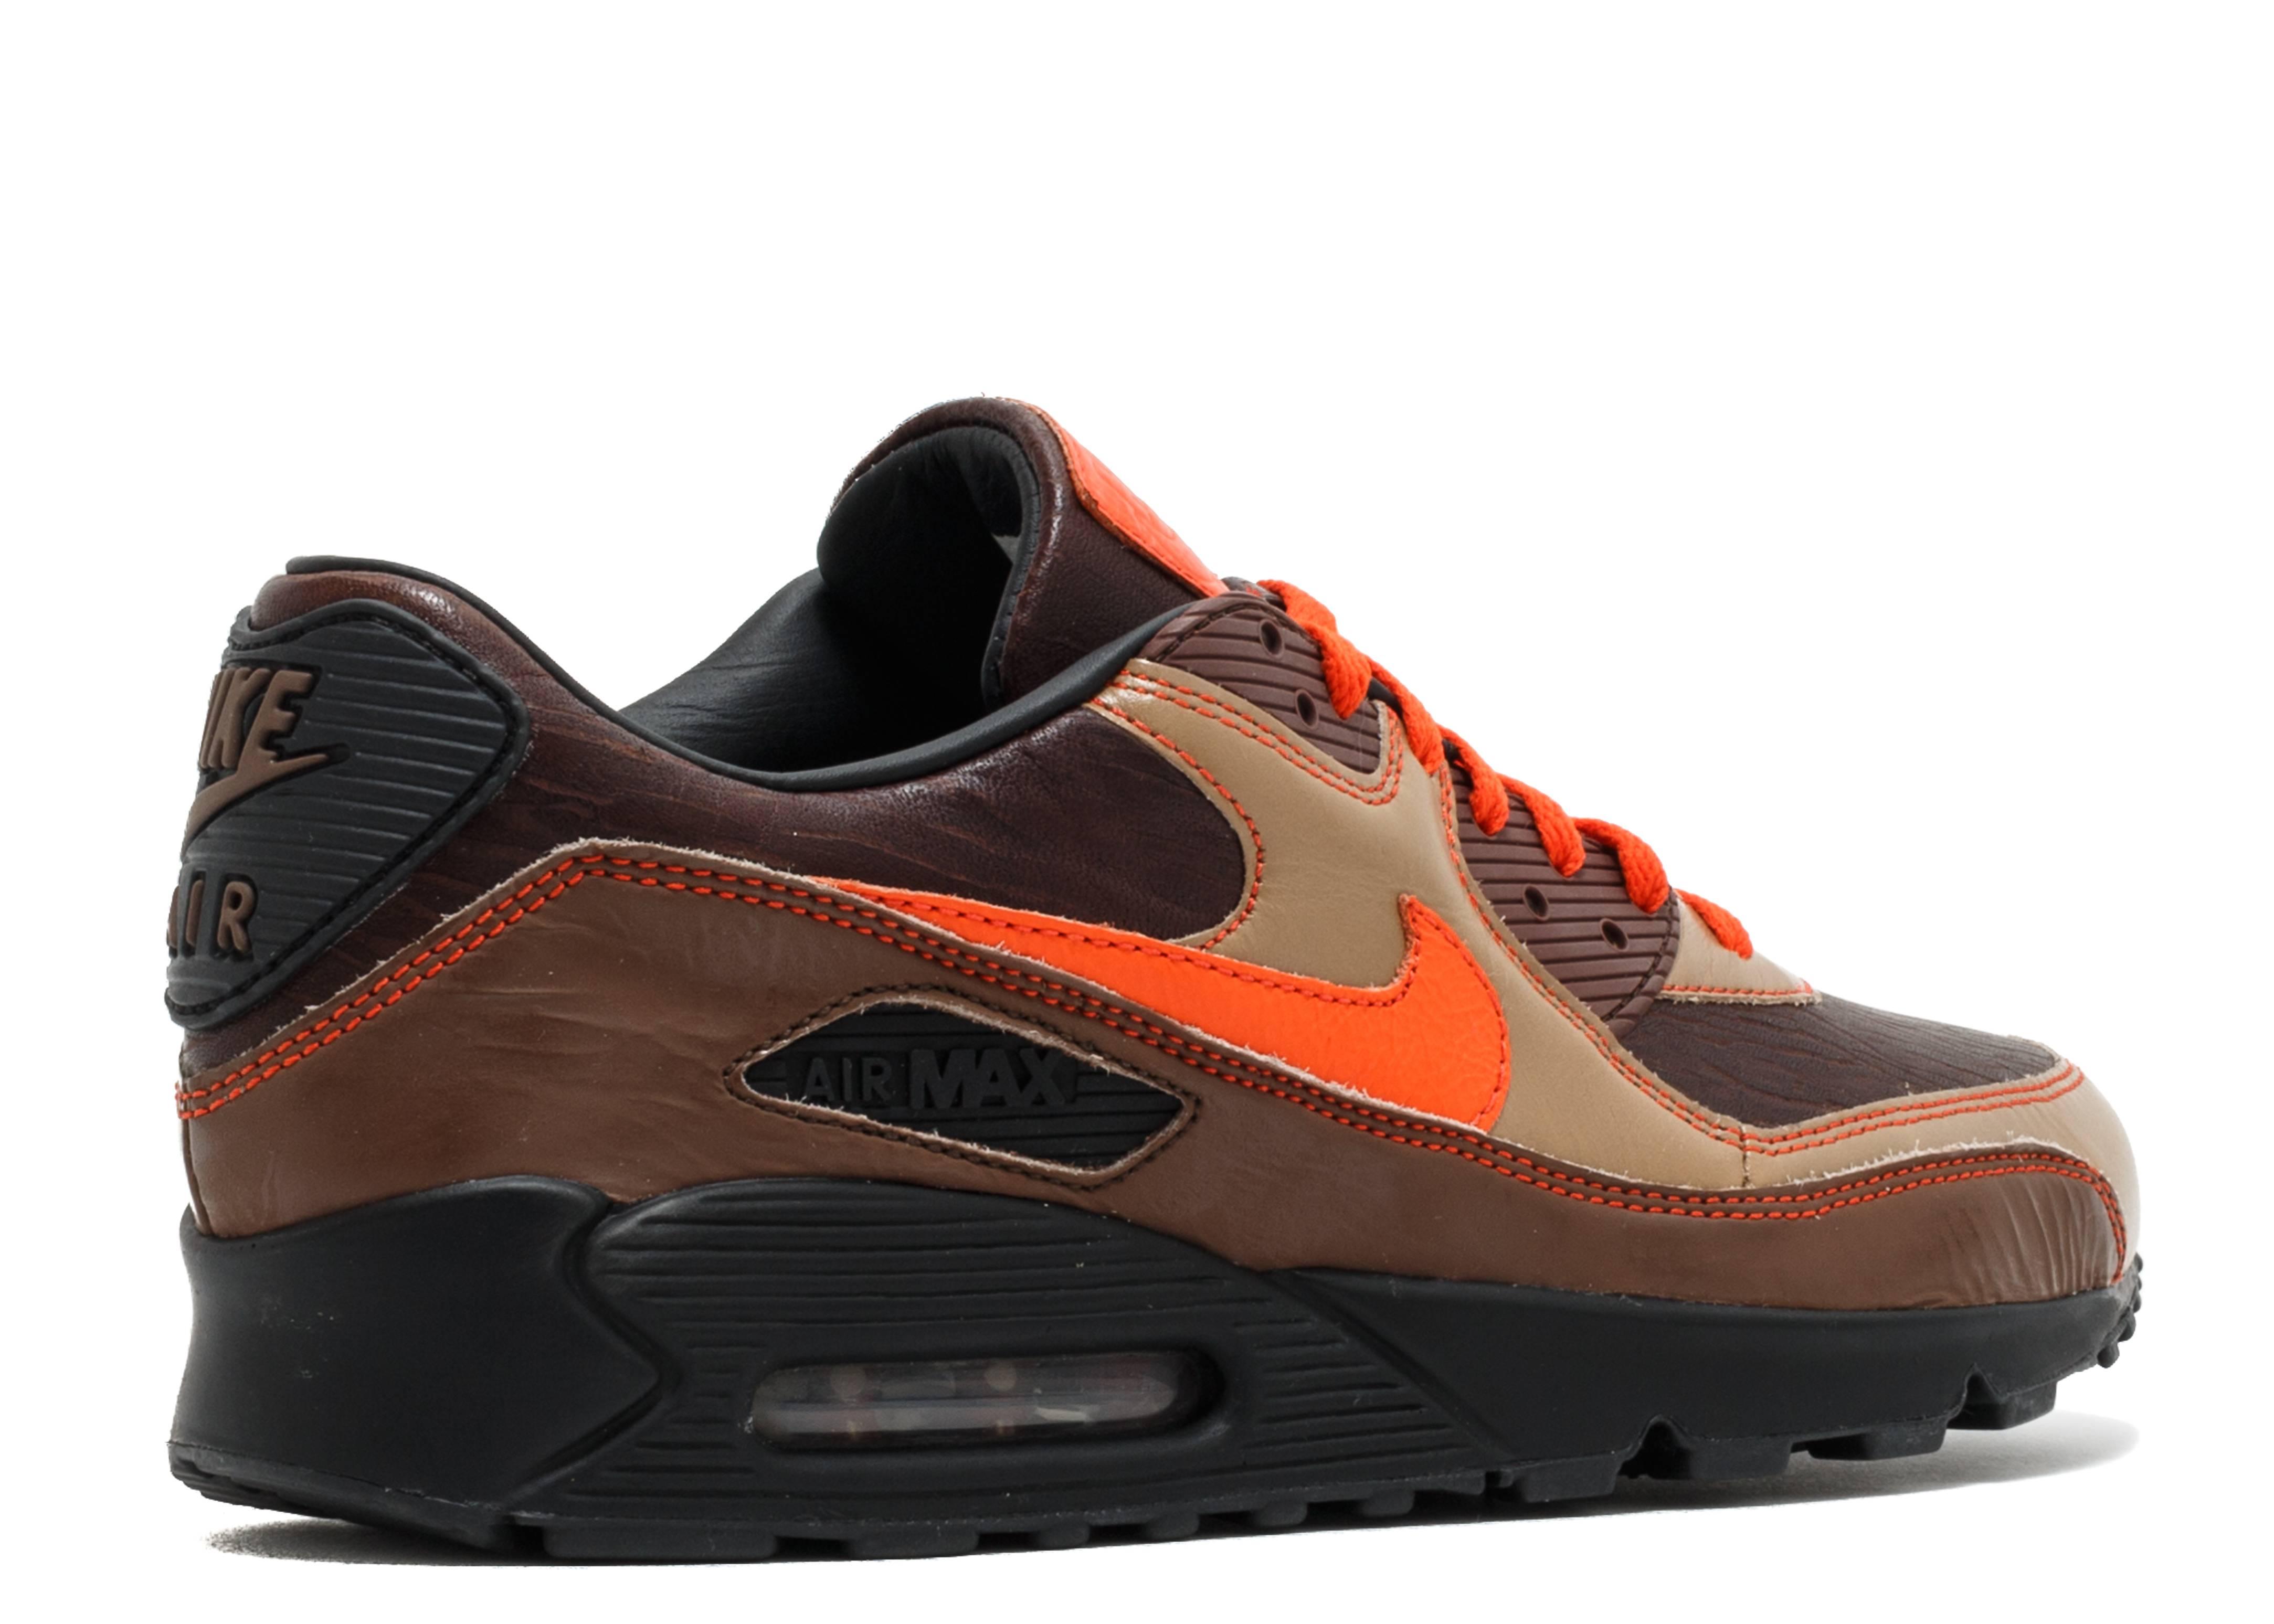 Air Max 90 I.D Nike 318583 991 brown orange   Flight Club